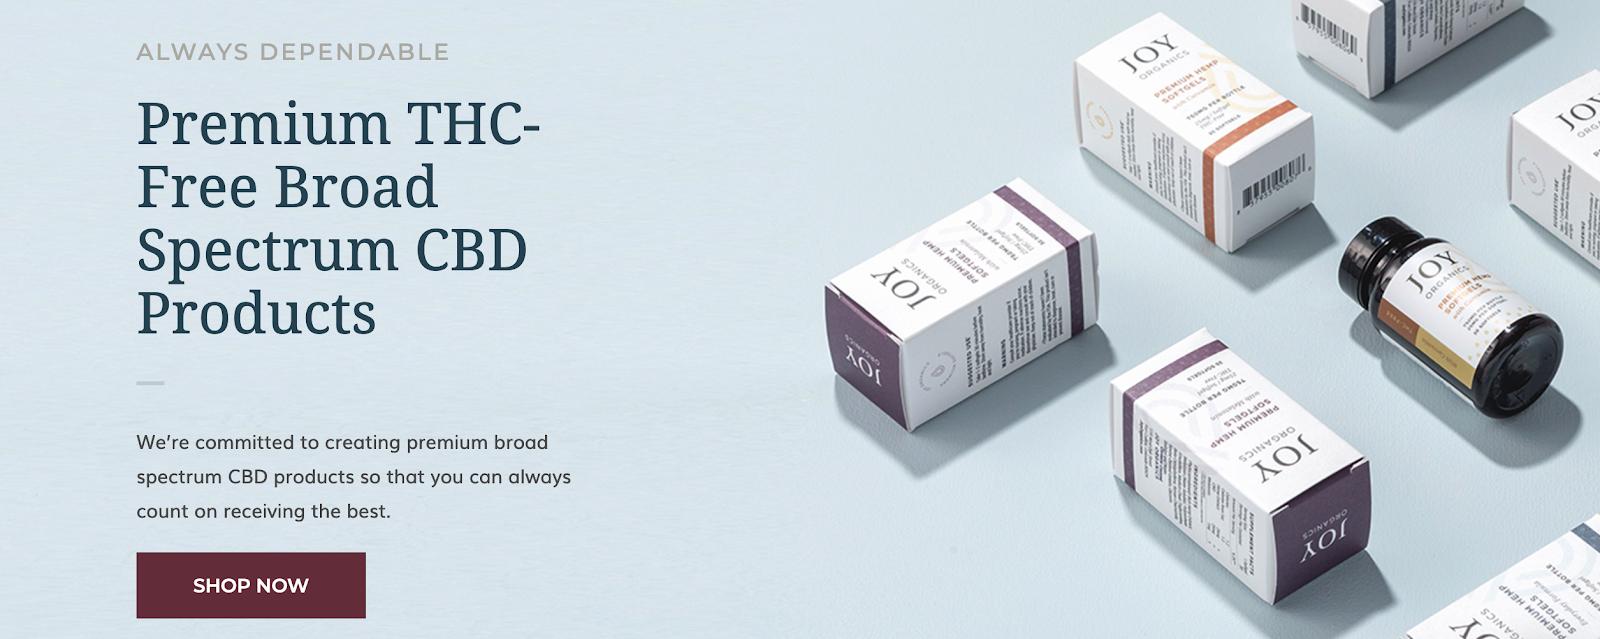 Joy Organics - CBD Health Brand